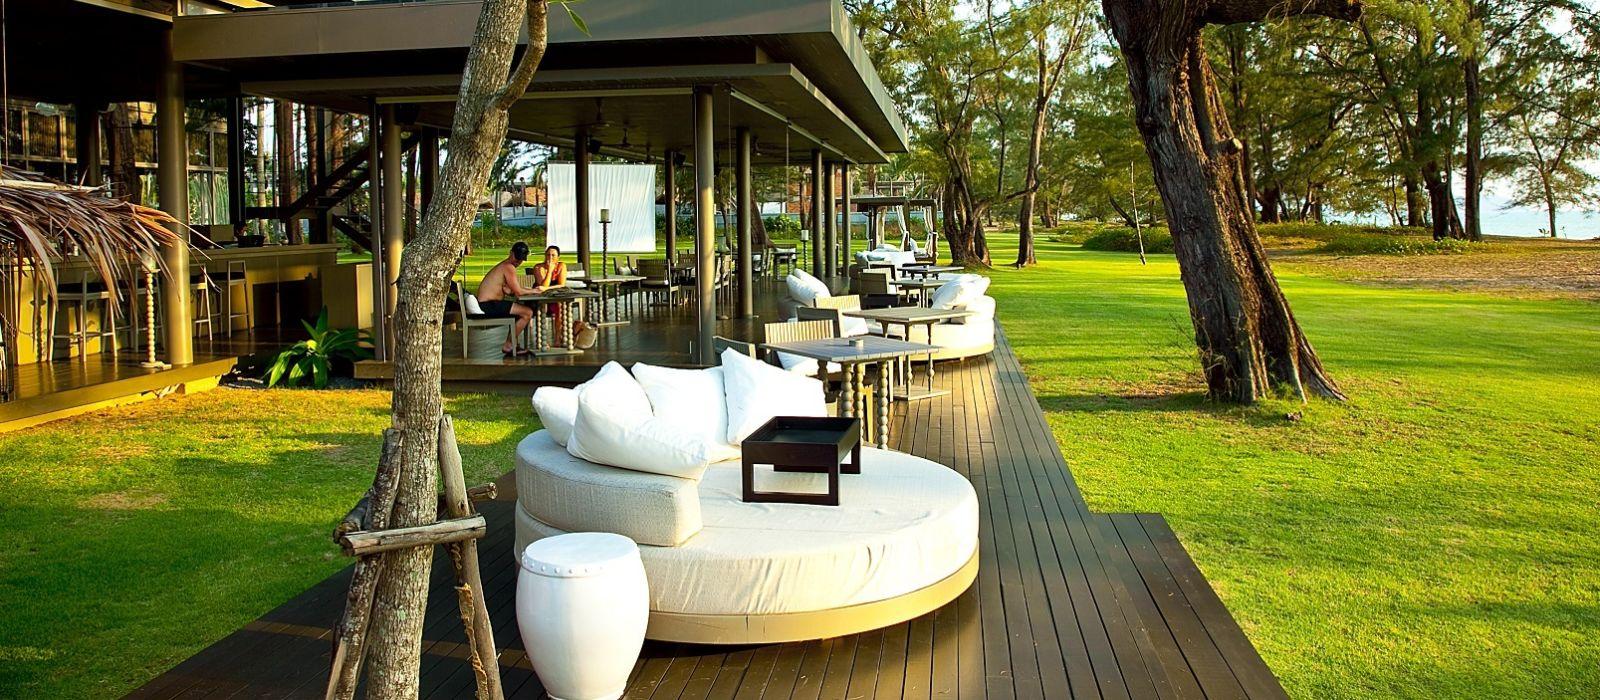 Sala Phuket Resort Spa Hotel In Thailand Enchanting